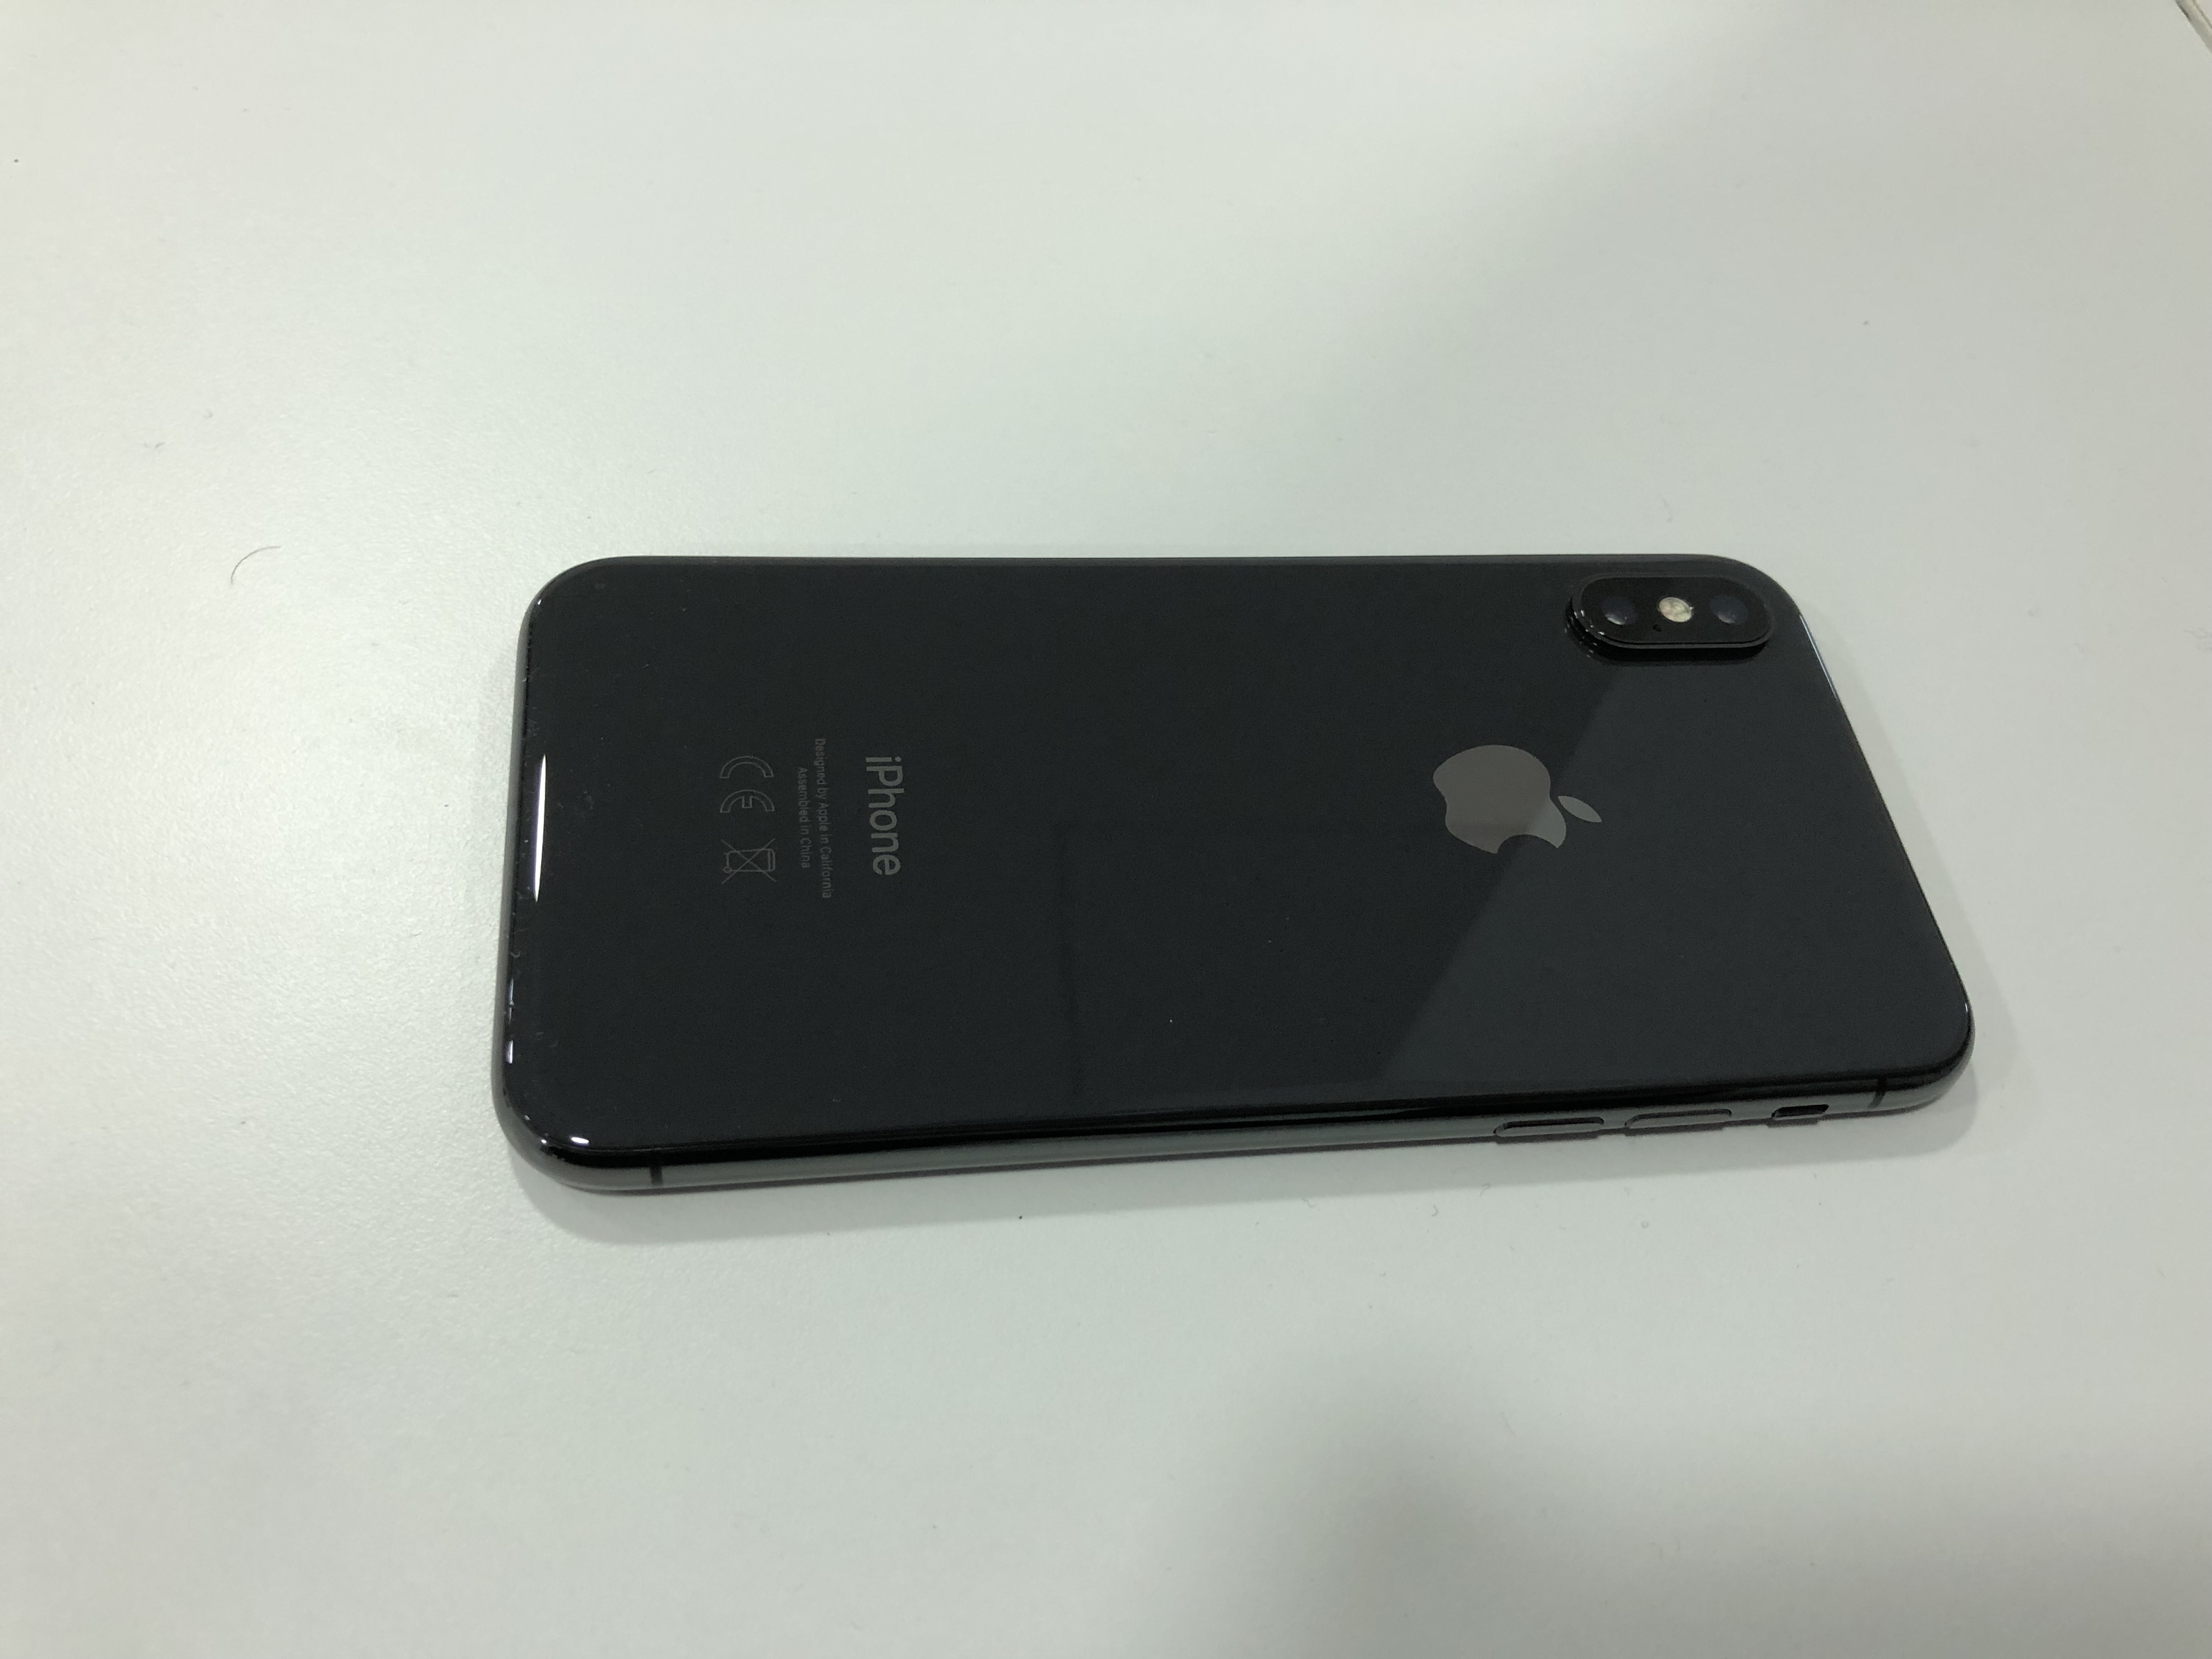 iPhone X 64GB, 64 GB, Space Gray, imagen 2